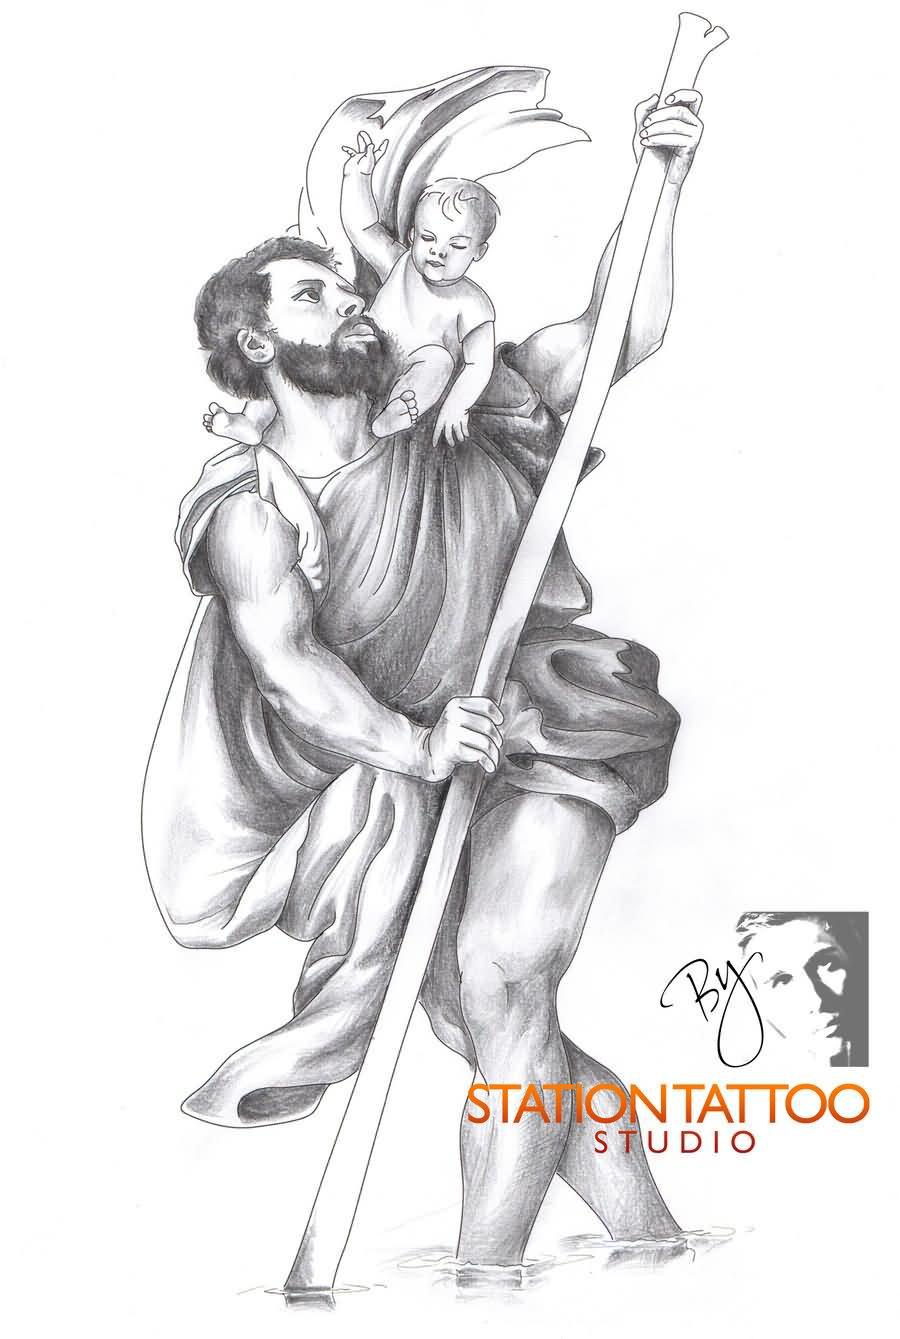 Black Ink Saint Christopher Tattoo Design For Forearm